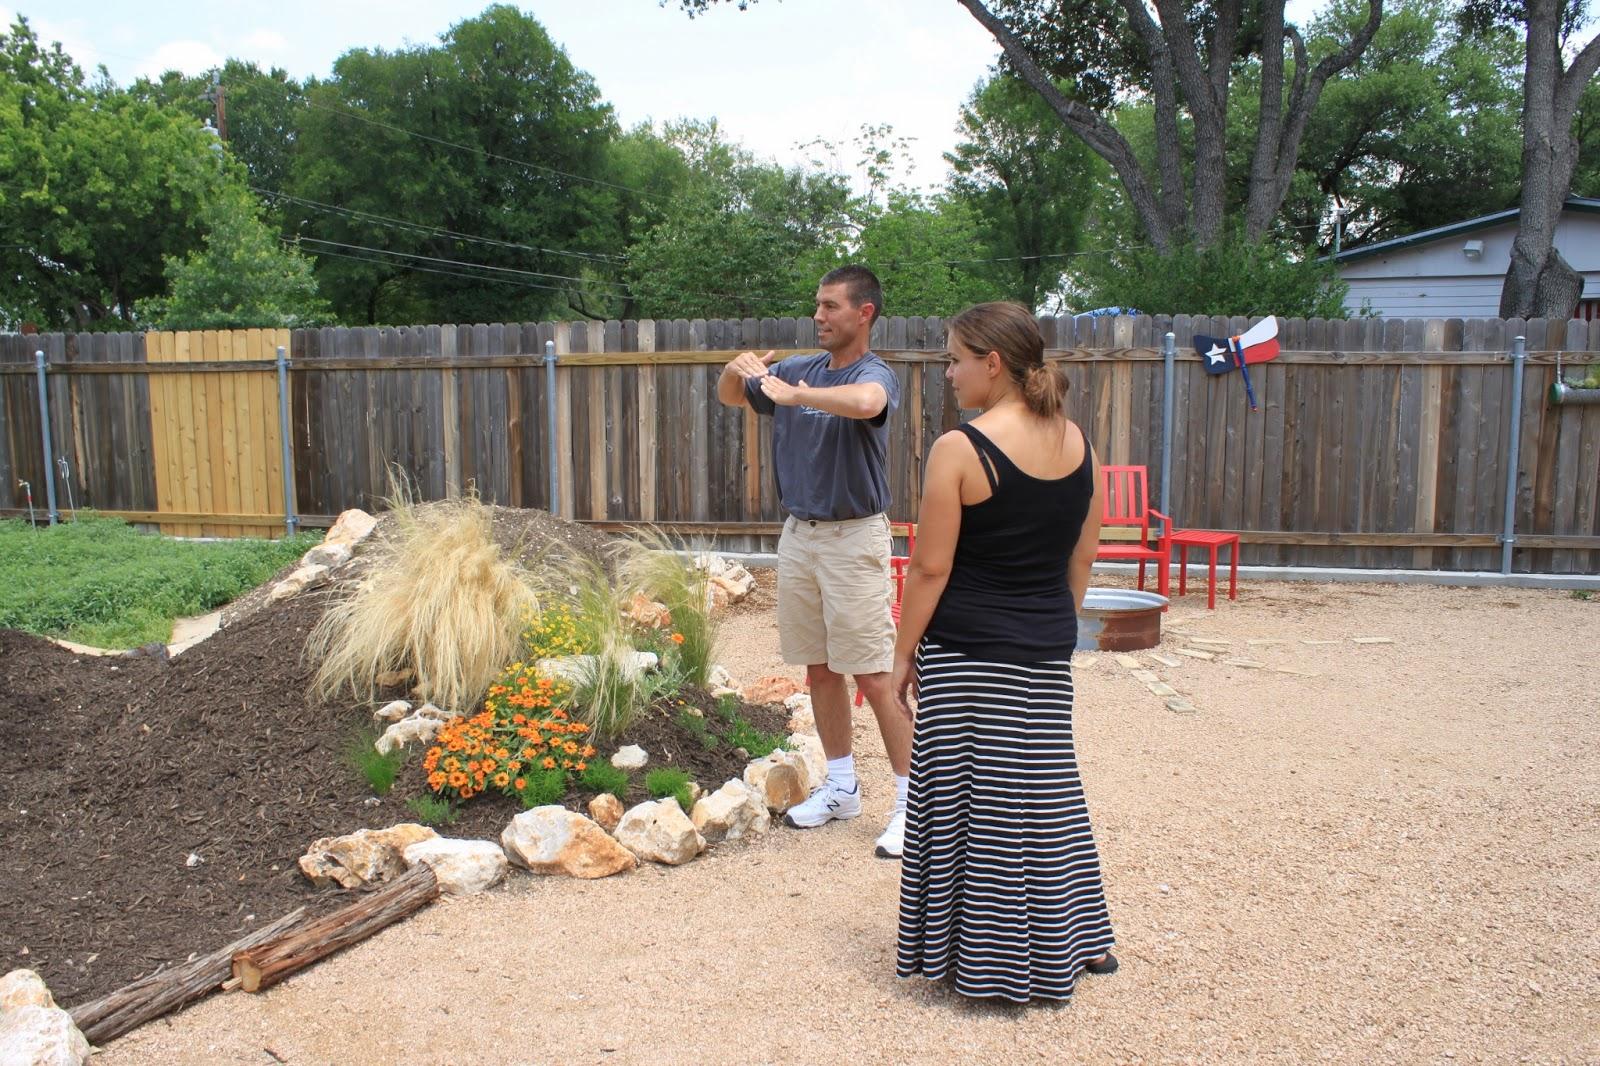 Rock Oak Deer Visting Xericstyle Garden